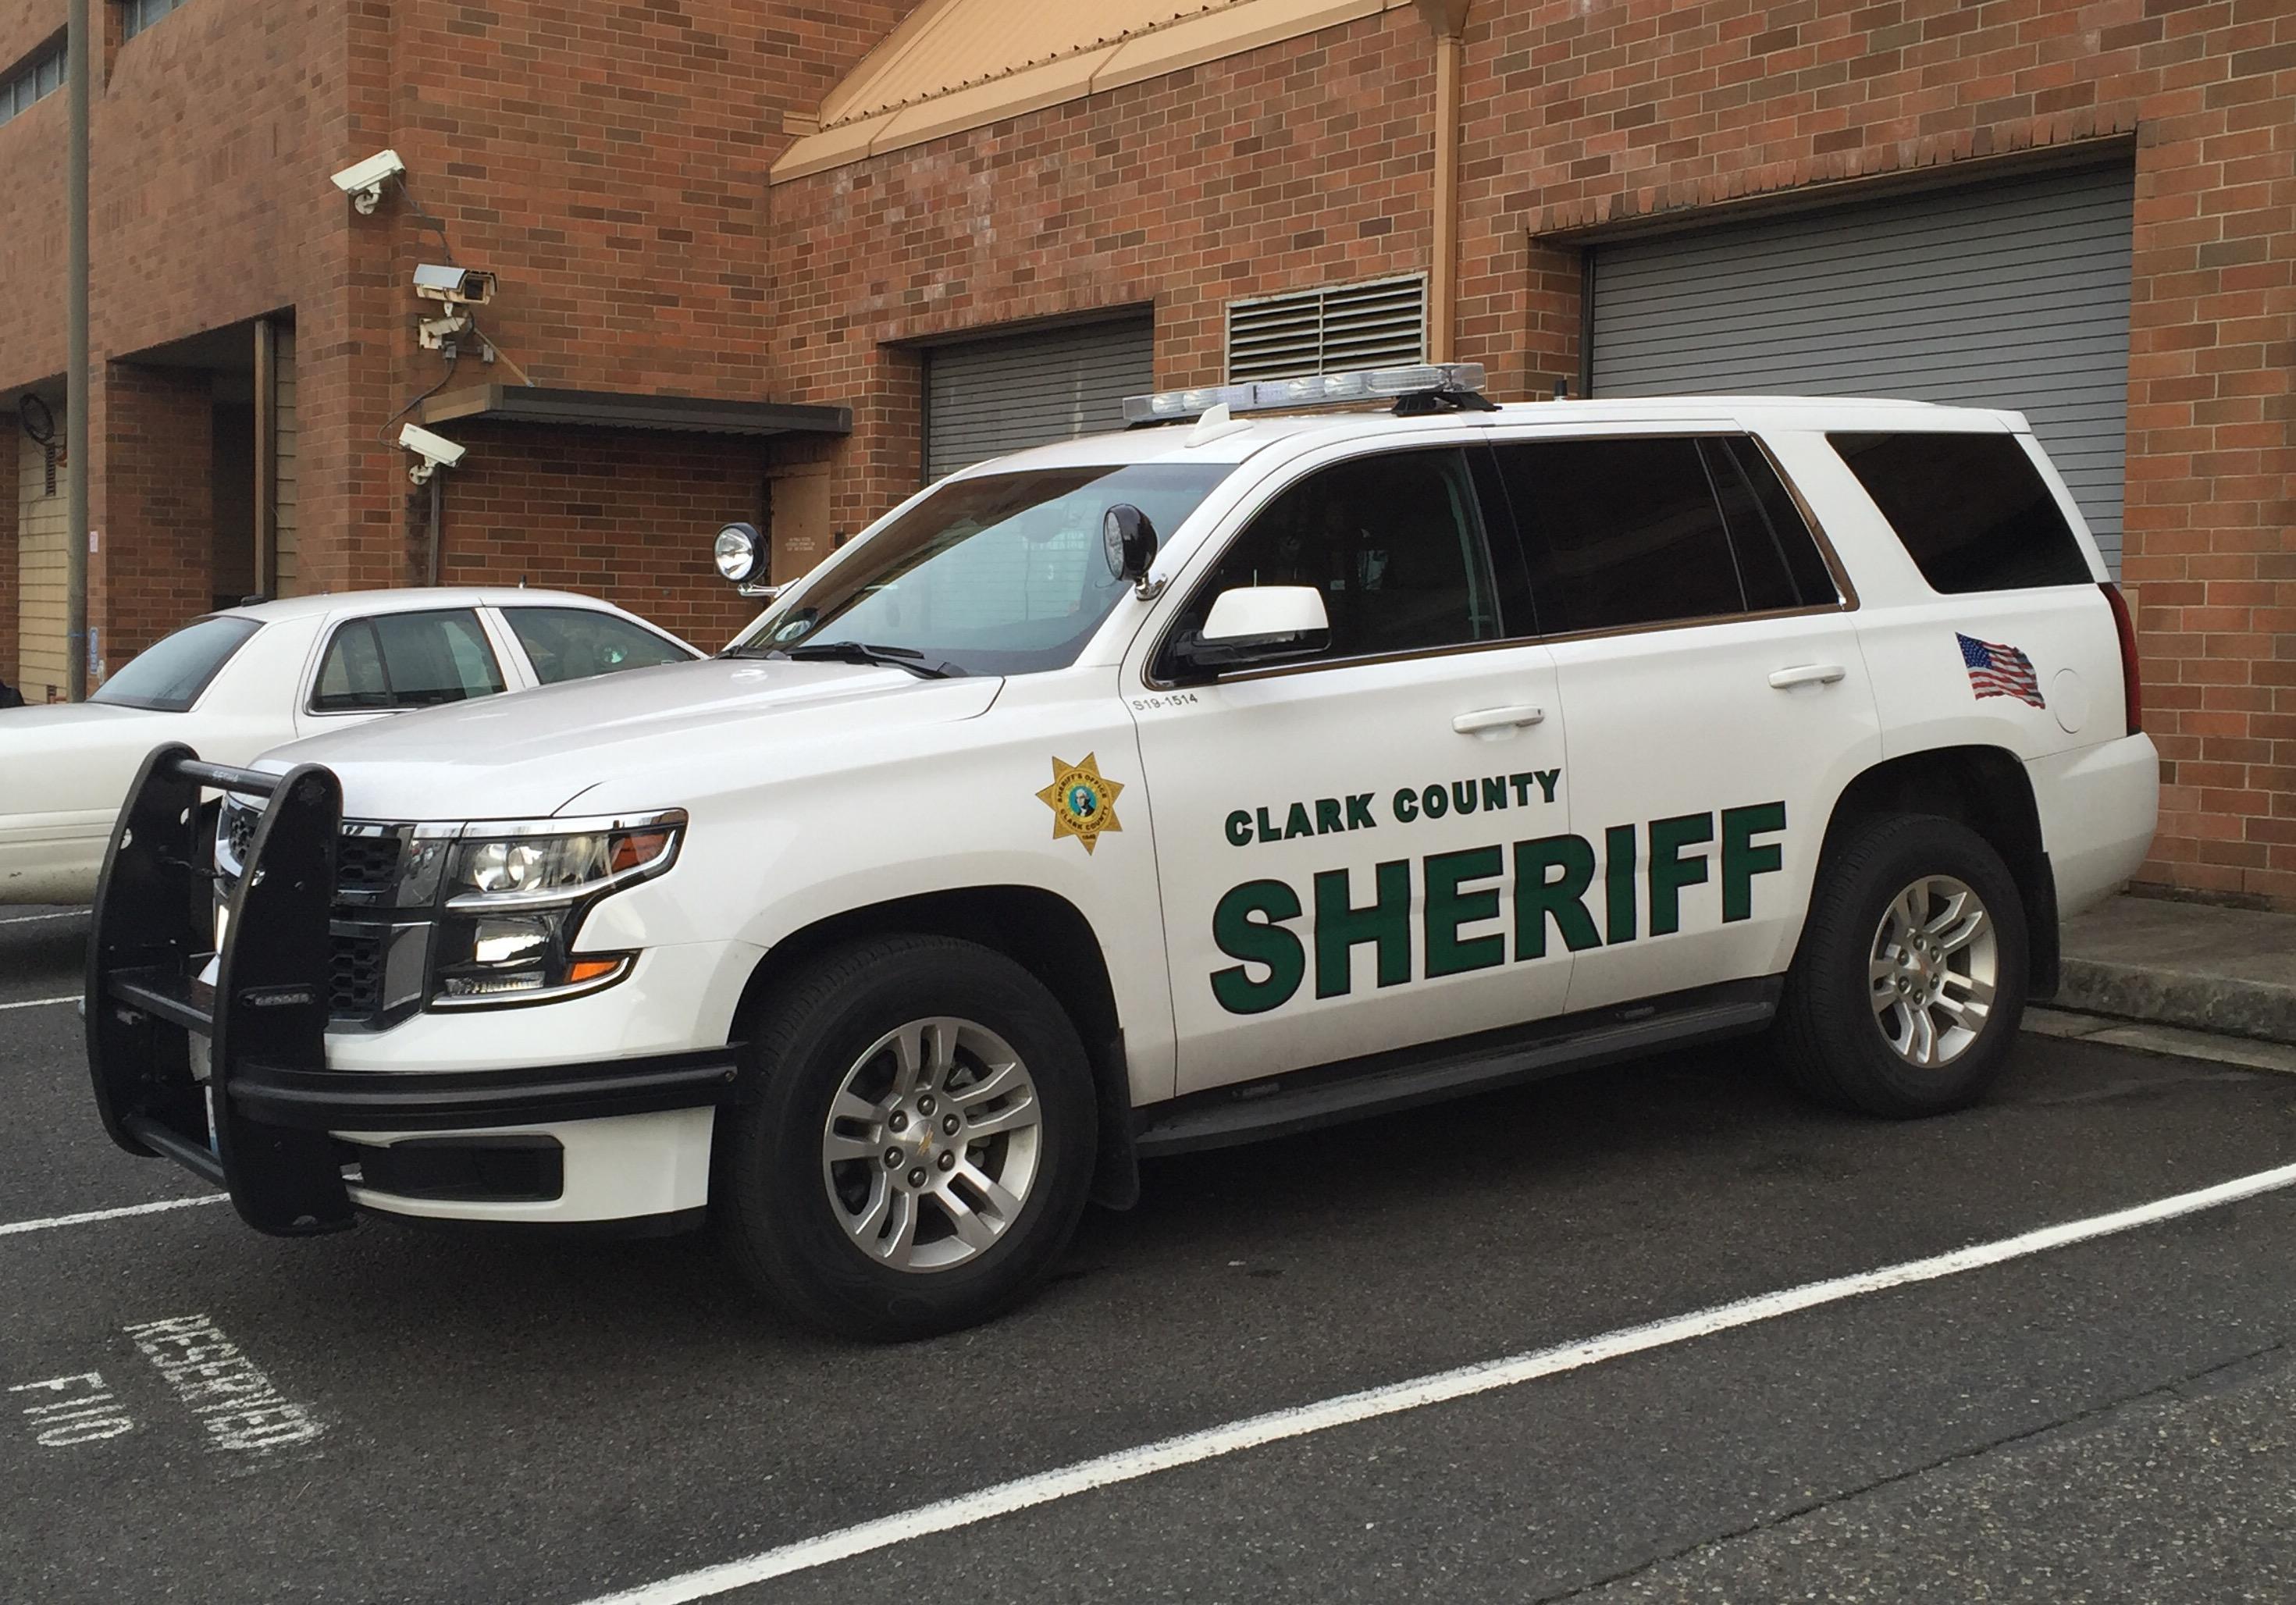 Clark County Sheriff's Office (Washington) - Wikipedia